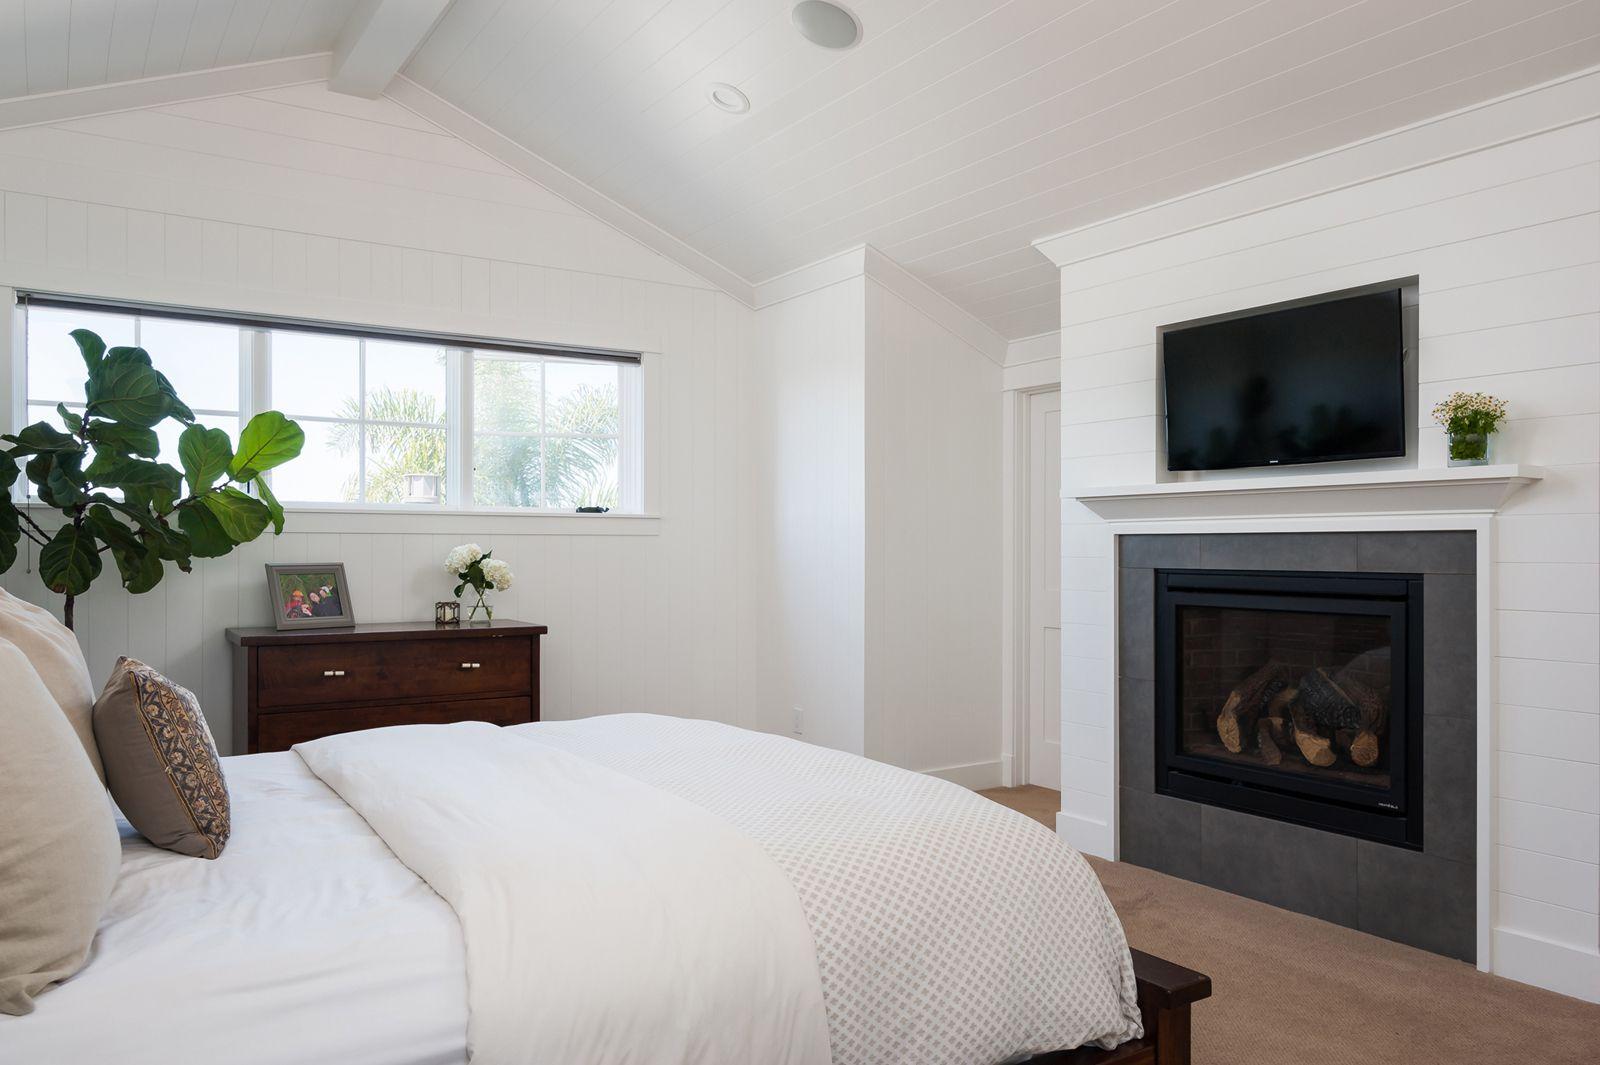 Highland Modern Farmhouse Master bedroom design